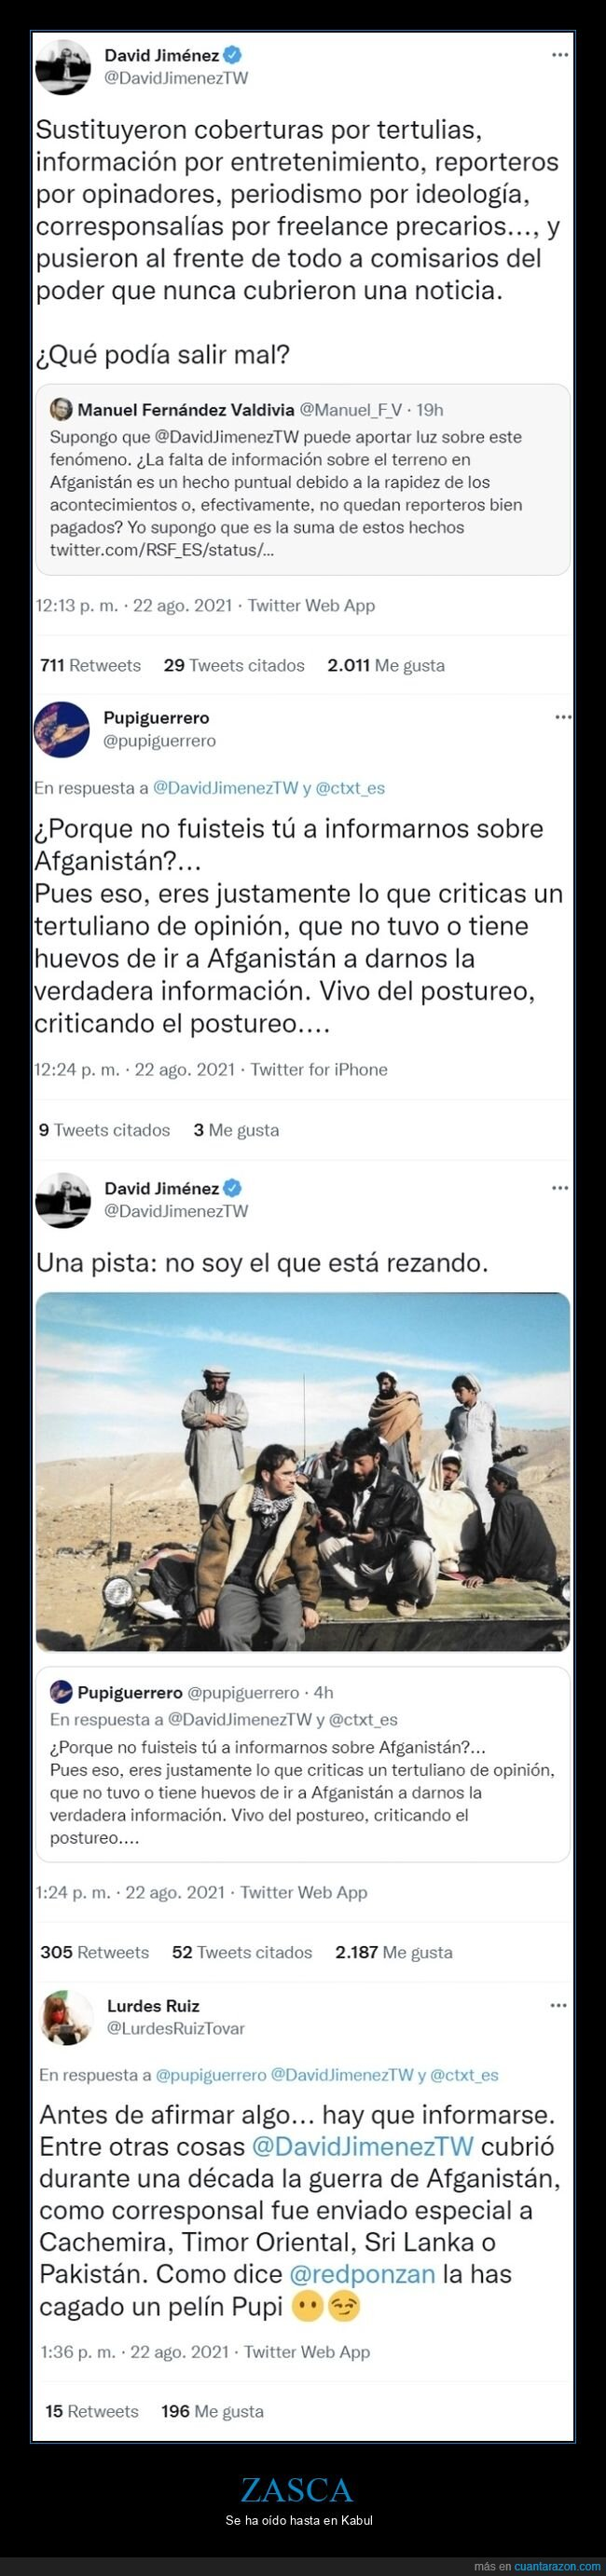 afganistán,informar,zasca